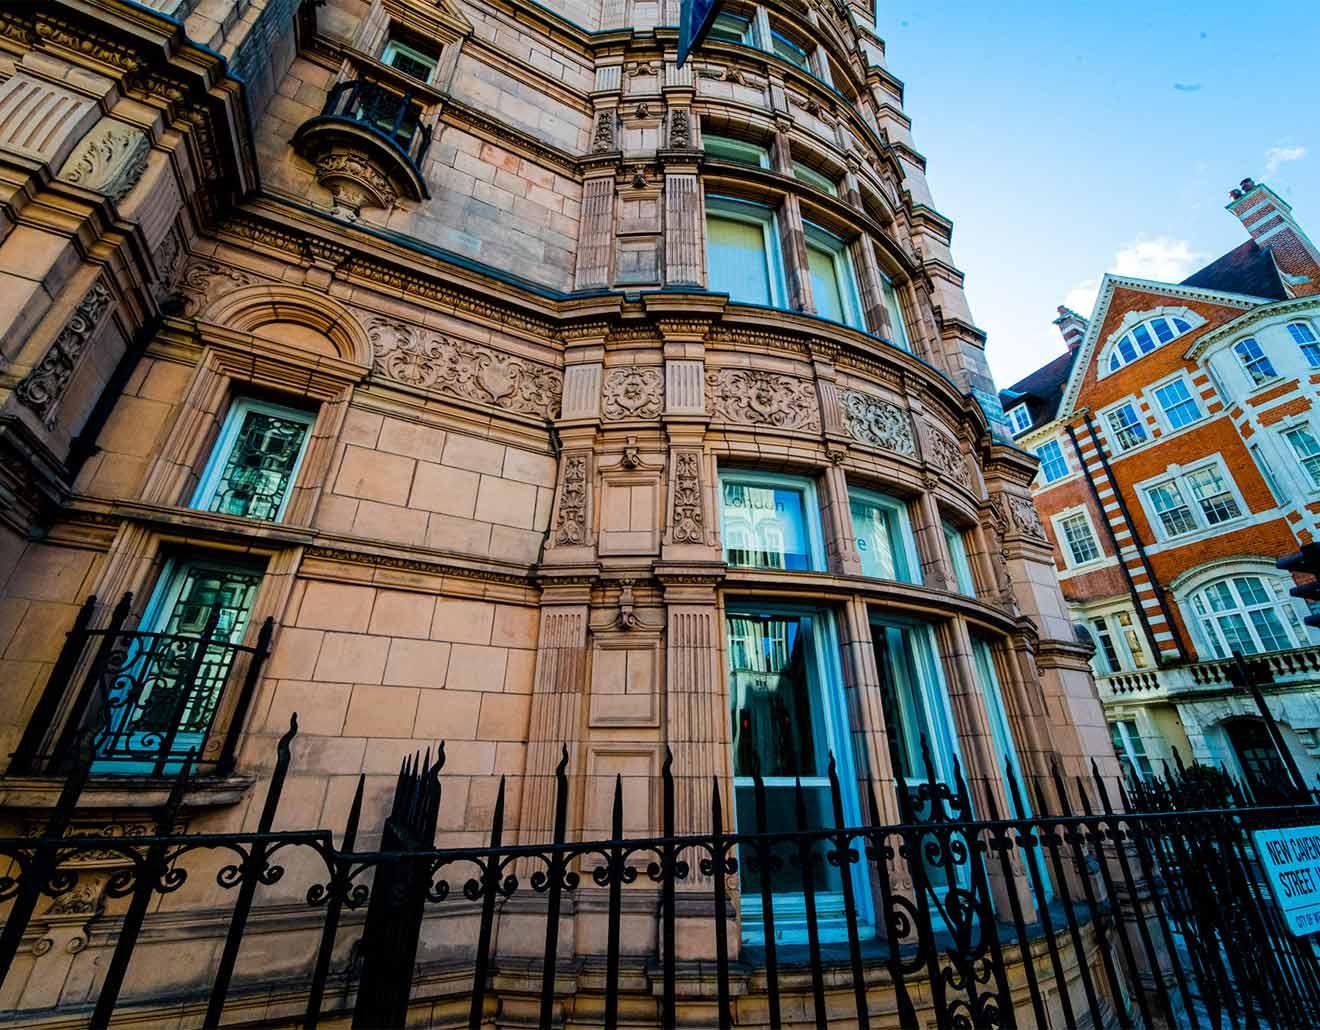 London Cataract Centre Wimpole Street London Cataract Centre